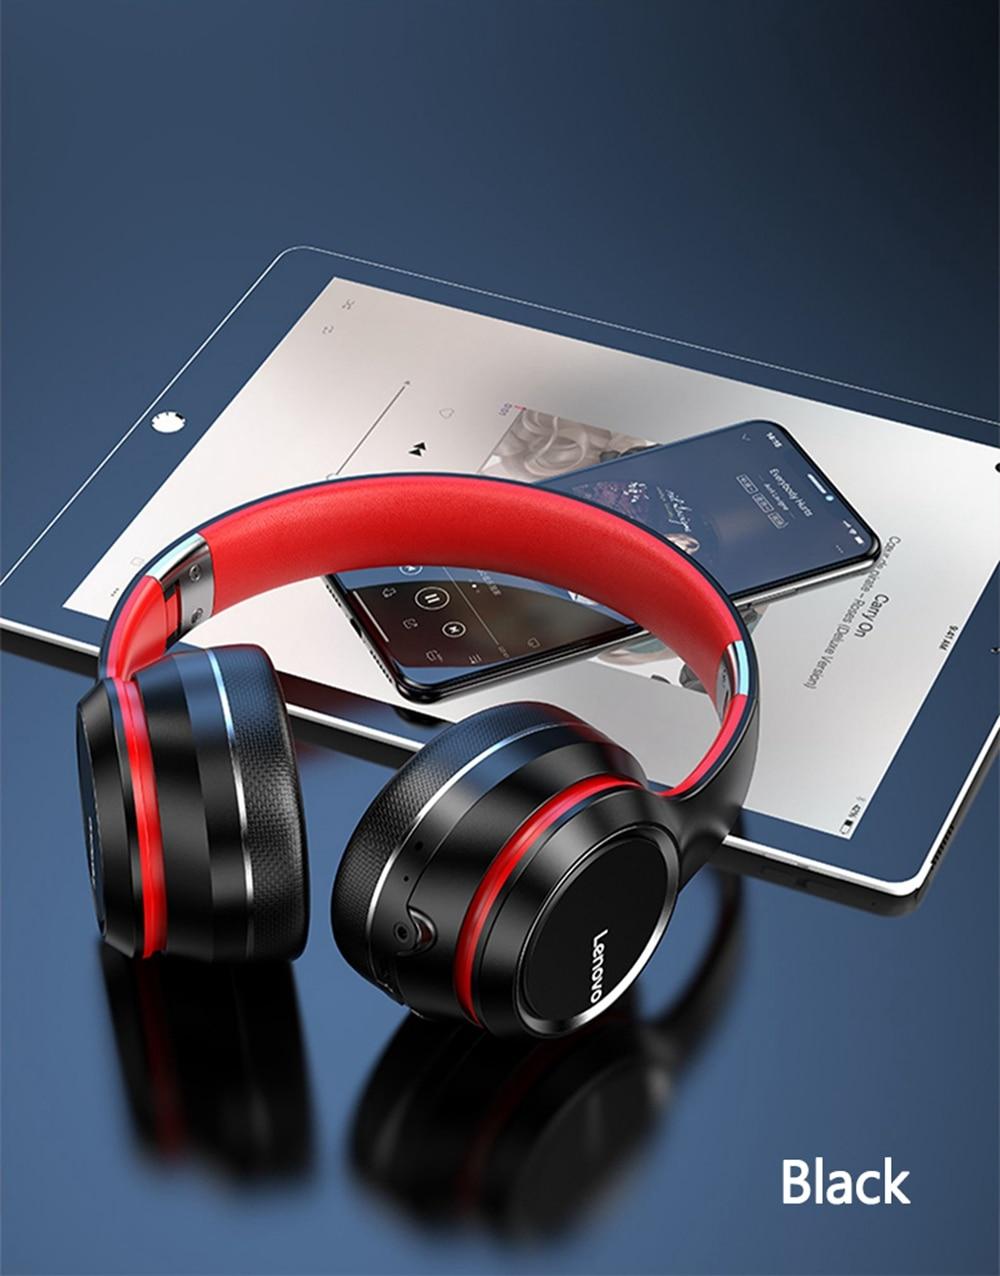 Lenovo HD200 Bluetooth Draadloze Stereo Hoofdtelefoon BT5.0 Lange Standby Leven Met Noise Cancelling Voor Xiaomi Iphone Lenovo Headset 21